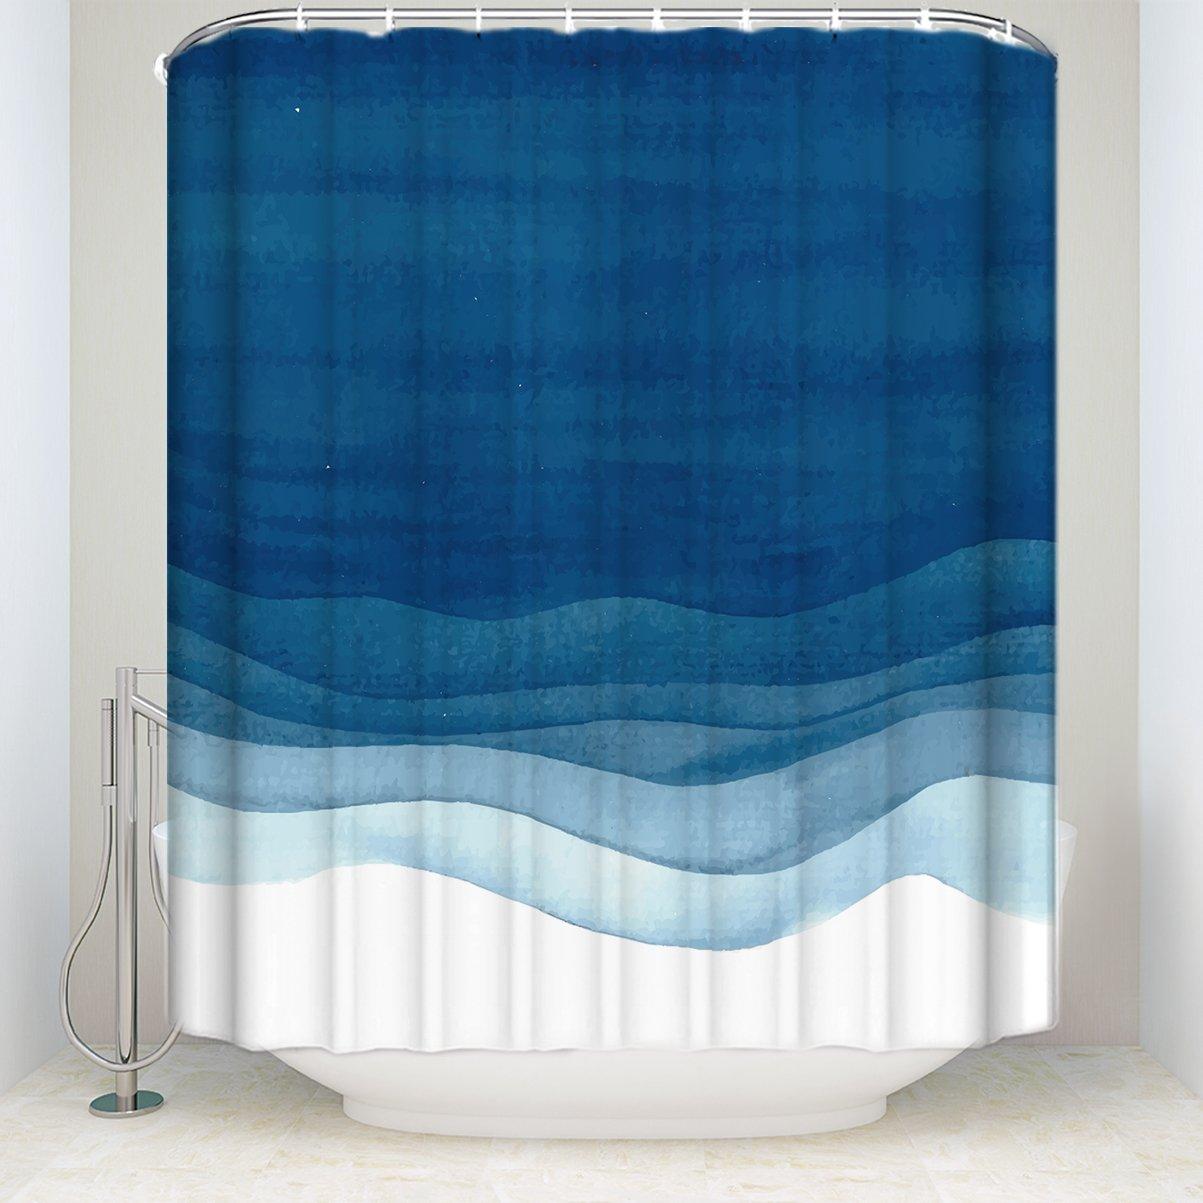 "KAROLA Shower Curtain Bathroom Decor Shower Curtain 54"" x 72"" Blue Wavy Watercolor"